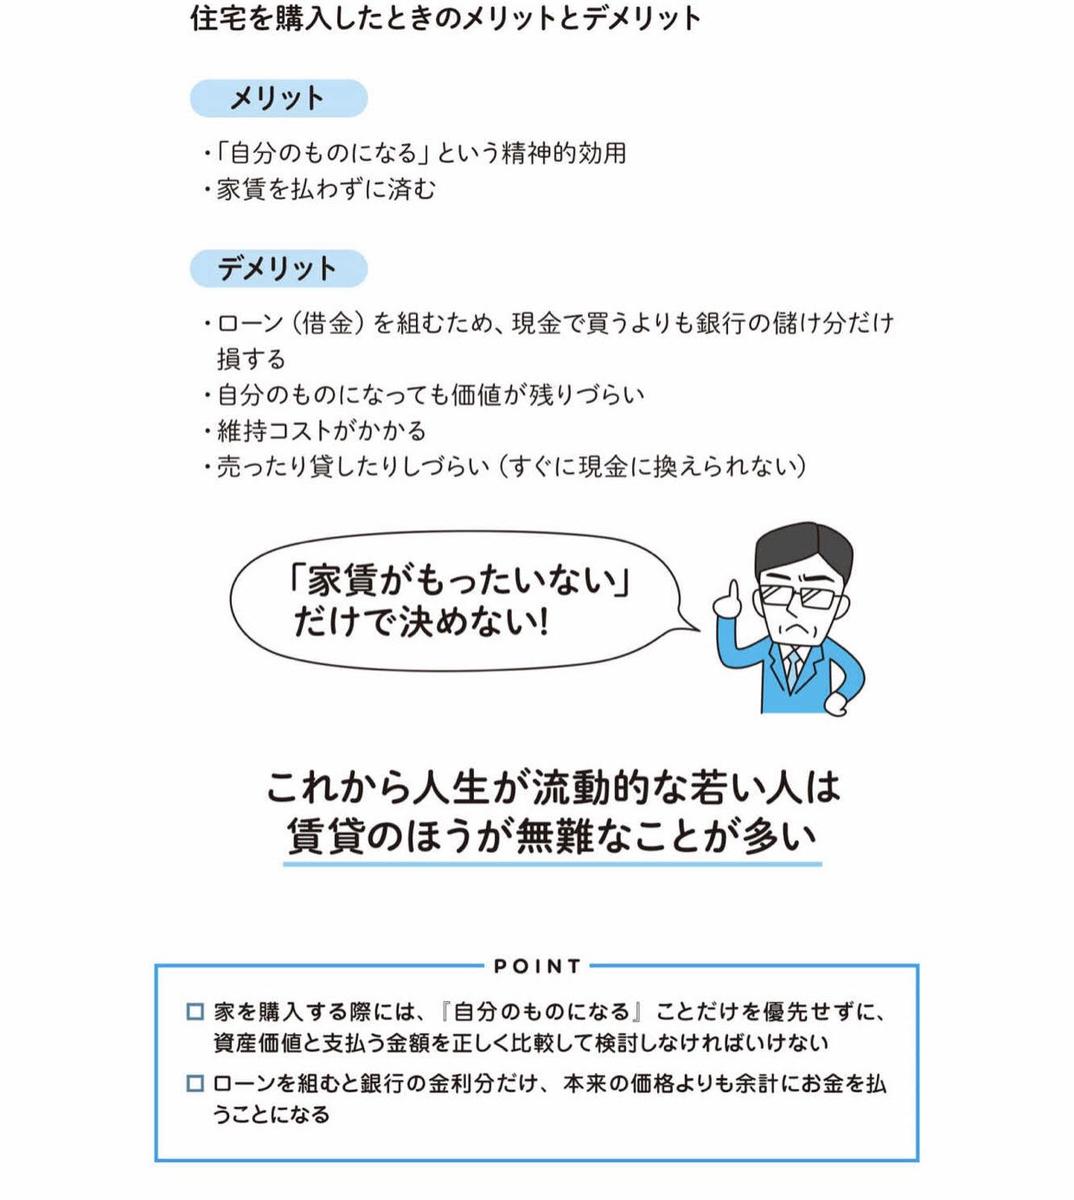 f:id:yougaku-eigo:20210424061659j:plain